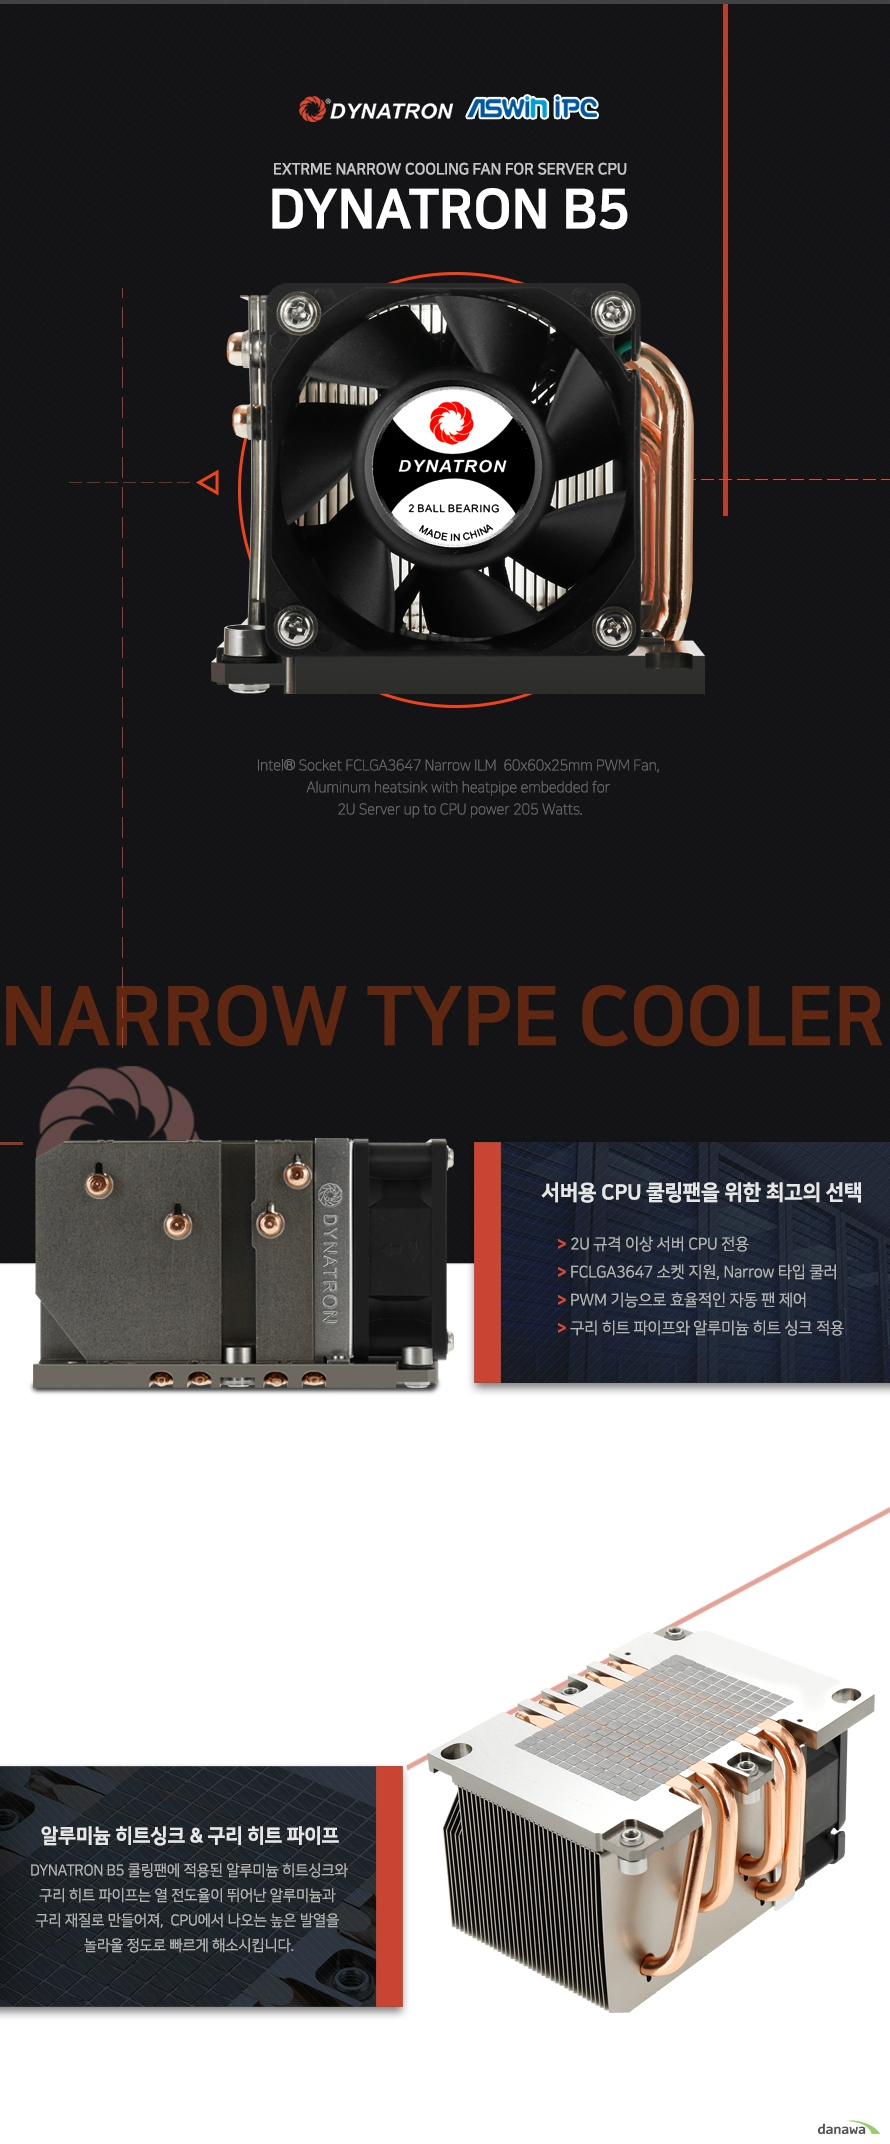 THE BEST COOLER OF THE WORLD        세계 최고의 쿨러를 제조한다는 굳은 신념으로 DYNATRON은 최상급 성능의 쿨러만을 고집합니다.        괴물같은 성능의 60MM AXIAL 쿨링팬    DYNATRON B5 쿨러의 60MM AXIAL 쿨링팬은 최대 7000RPM 이라는 괴물같은 성능으로    24시간 끊임없이 구동하는 서버용 CPU를 항상 최적의 온도로 유지시켜줍니다.        오랜 사용에도 변함없는 쿨링팬 내구성        쉴틈없이 구동해야 하는 서버용 CPU쿨러에 오랜 사용에도 변함없는 안정적인 쿨링팬은 필수입니다.    DYNATRON B5는 쿨링팬에 2 BALL BEARING을 적용하여 뛰어난 내구성으로 오랜 사용에도 변함없는    성능을 제공합니다.